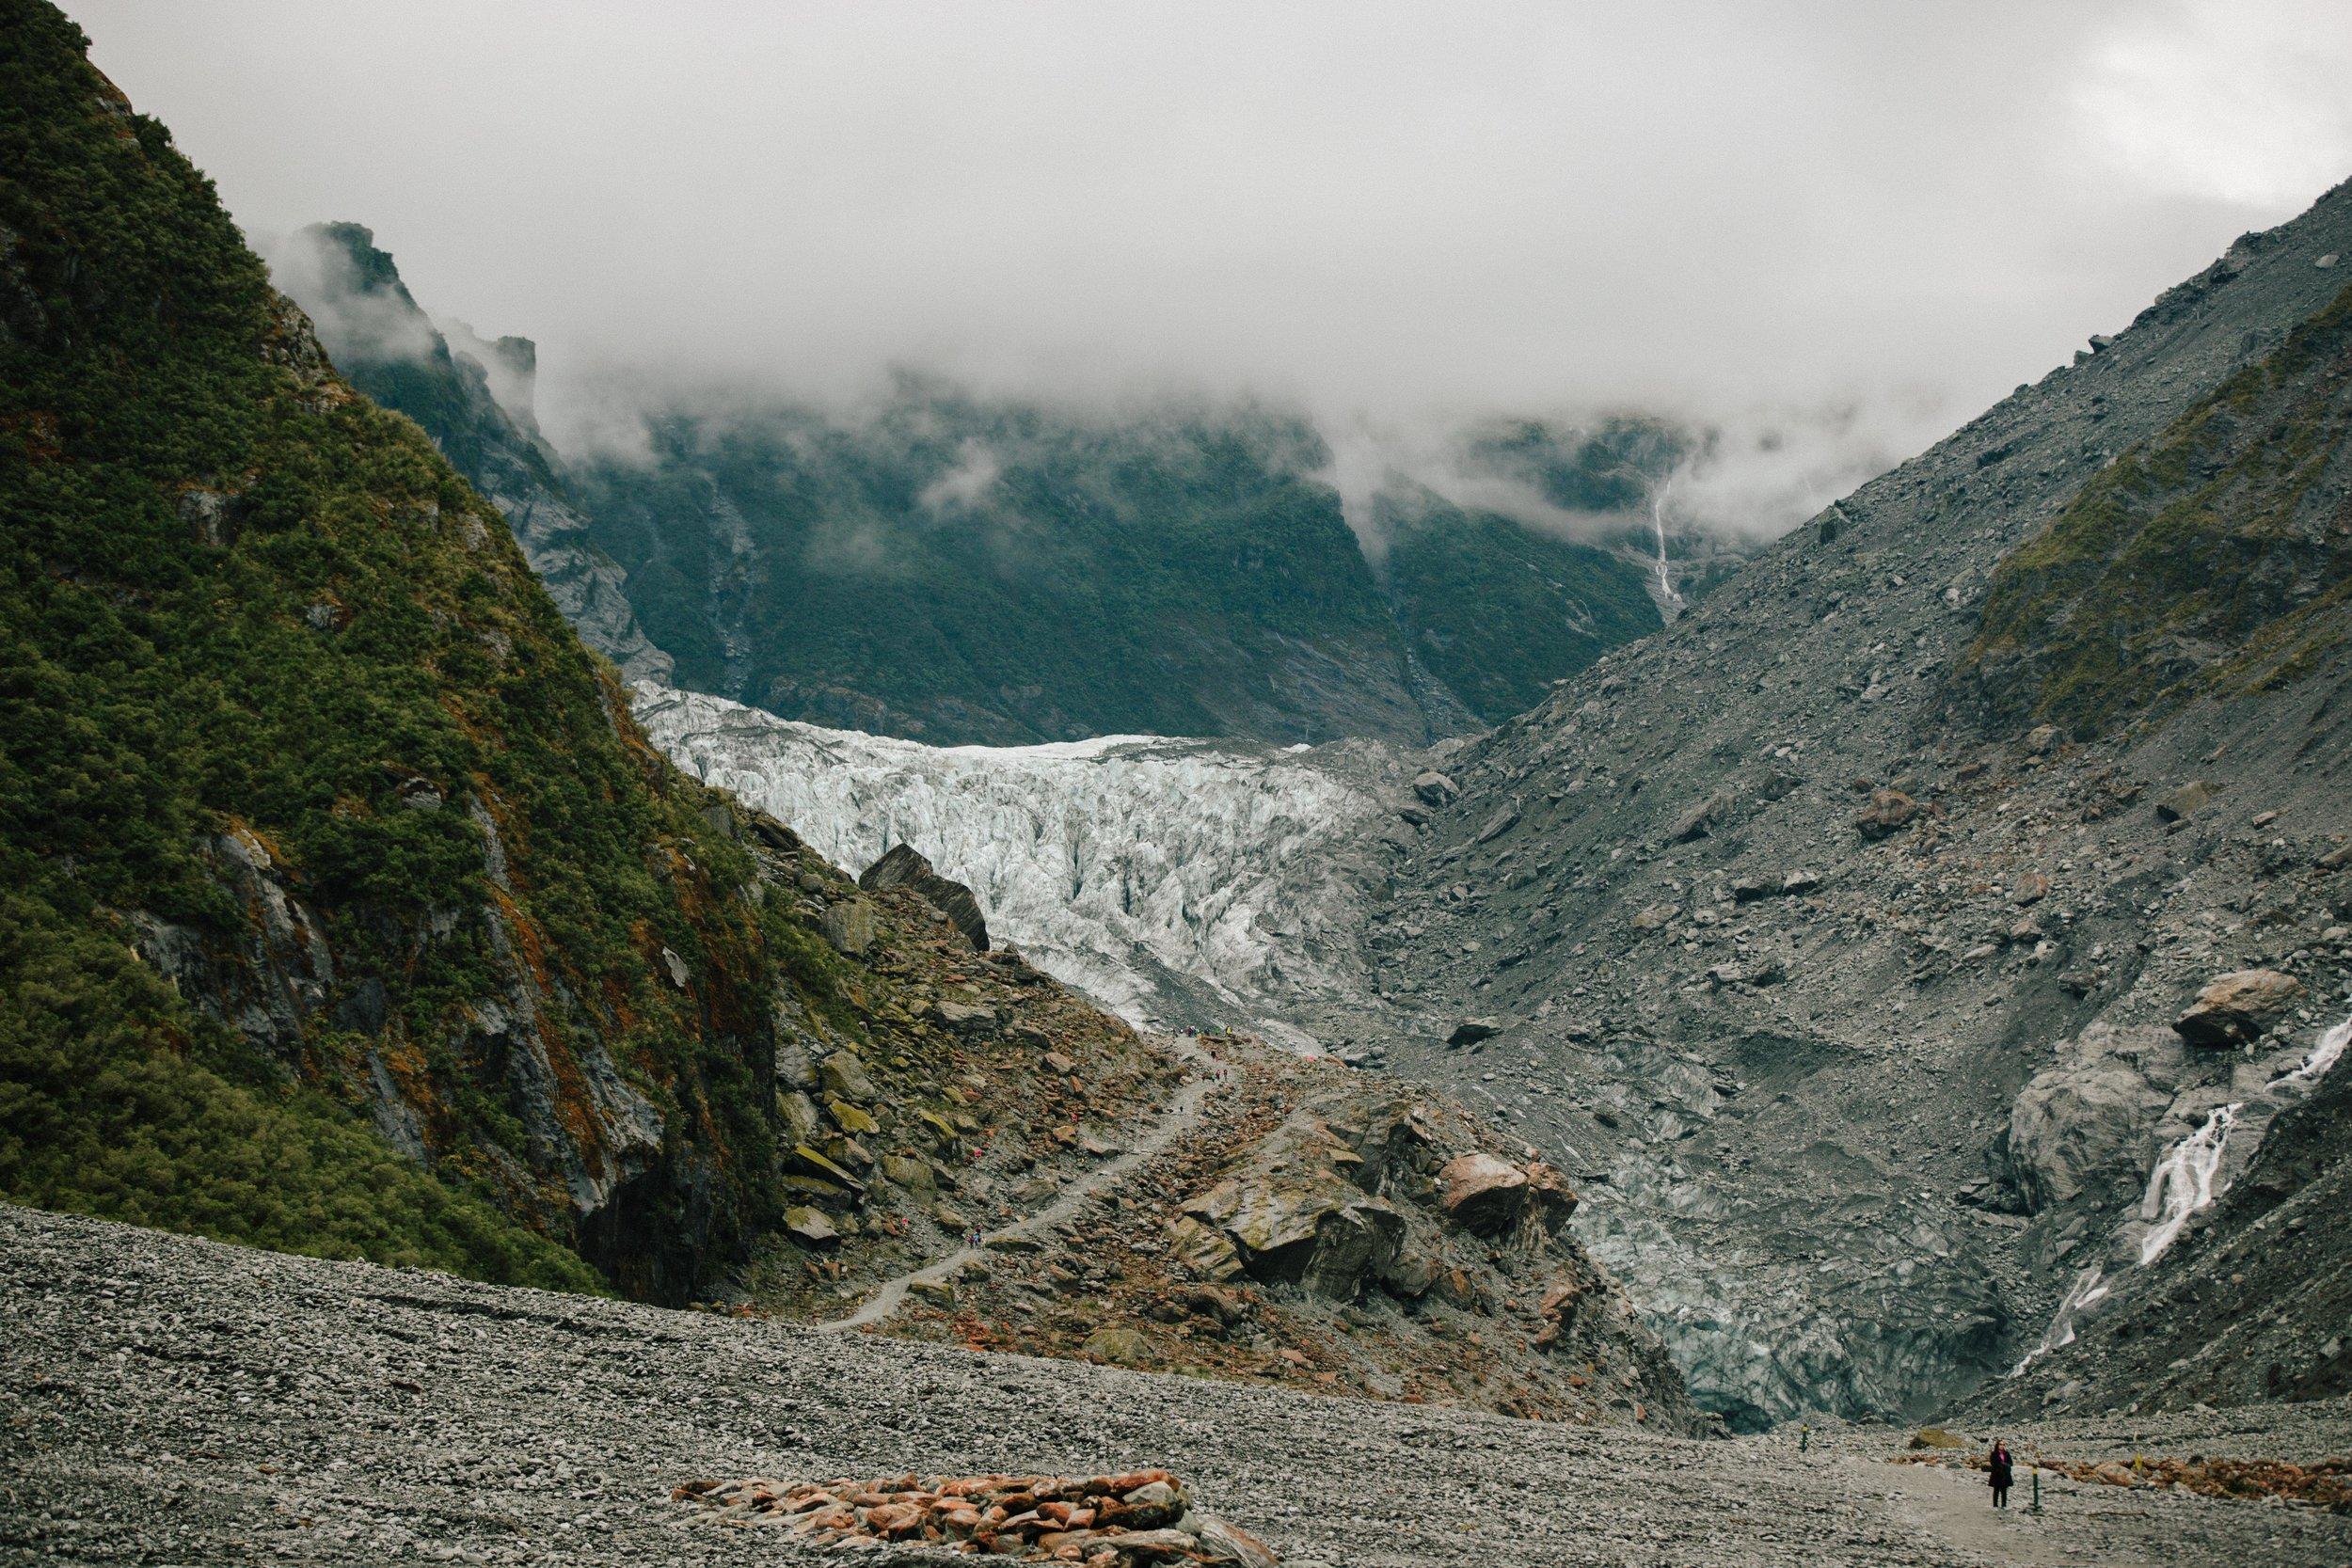 Glacier-New Zealand-Cloudy-Landscape.jpg